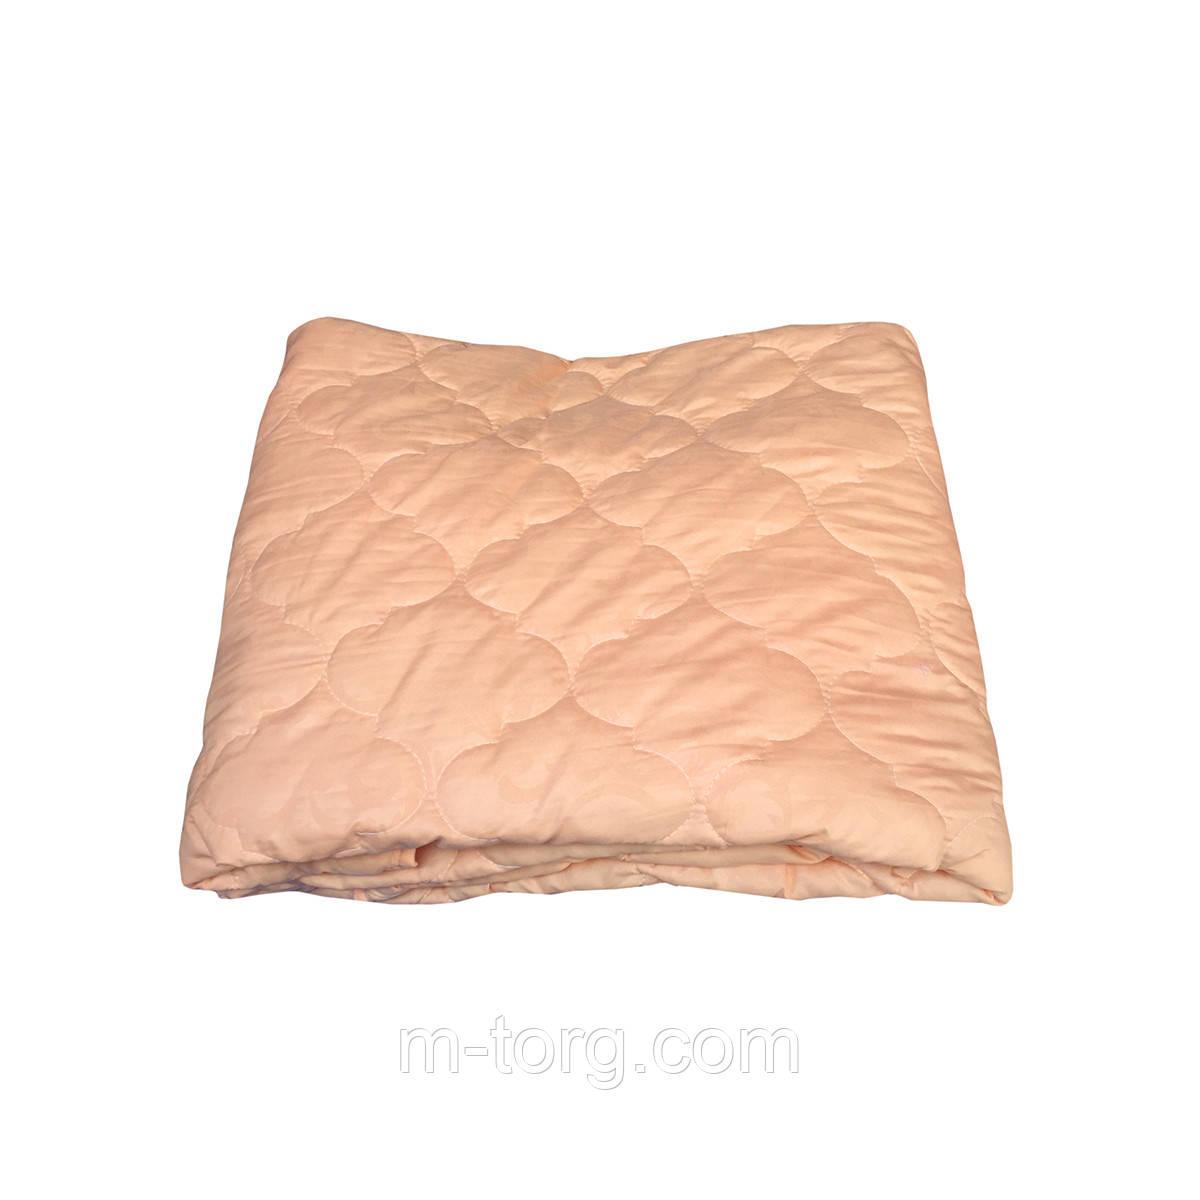 Бамбук летнее одеяло покрывало евро размер 195/205